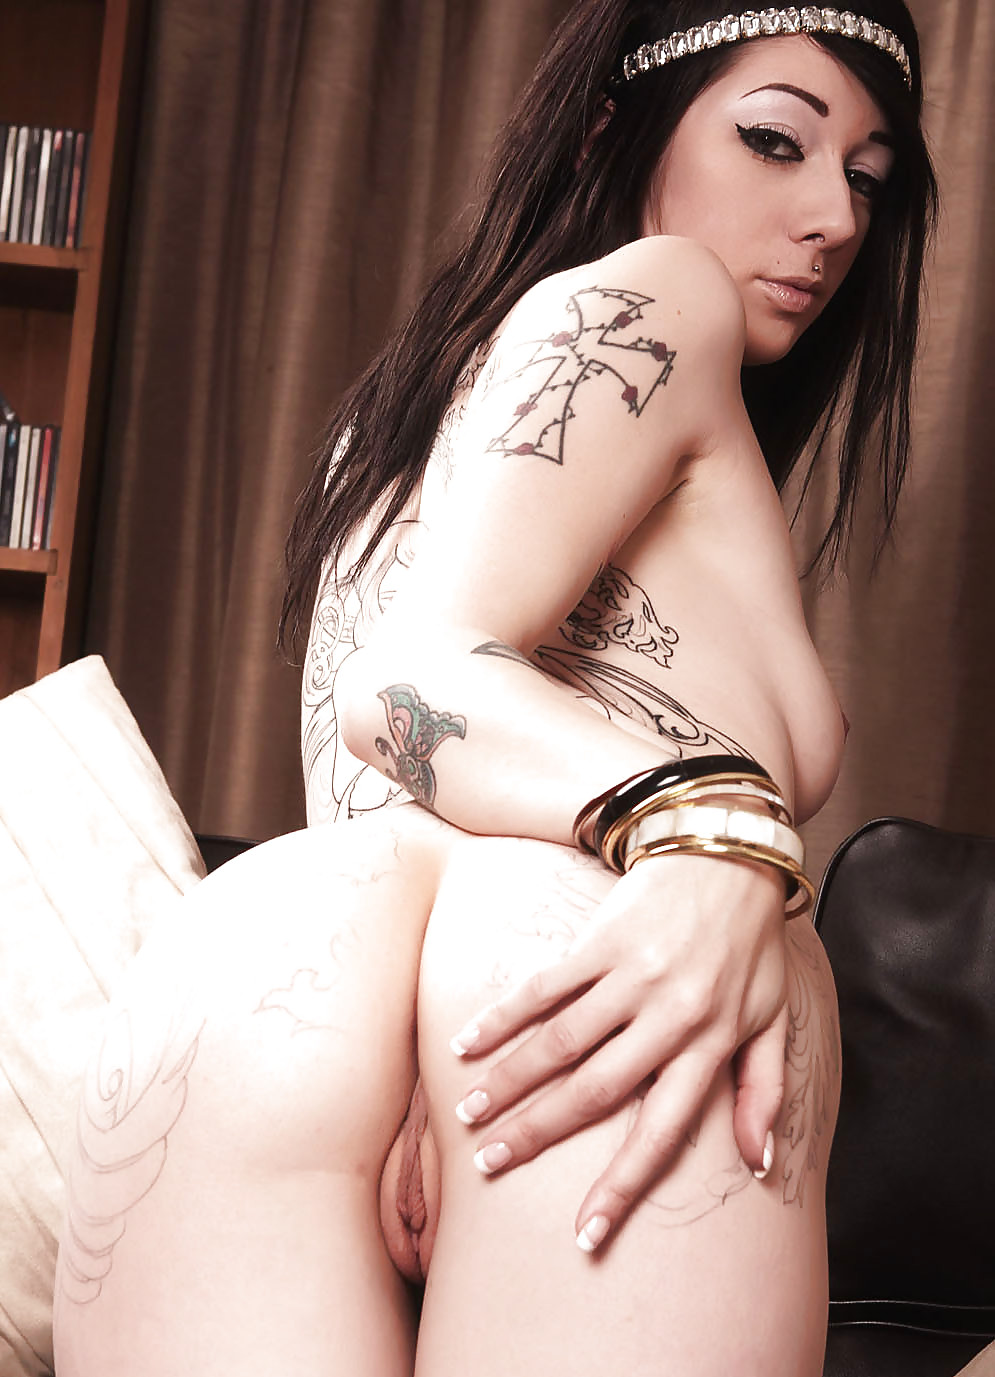 Hot punk chick porn 13